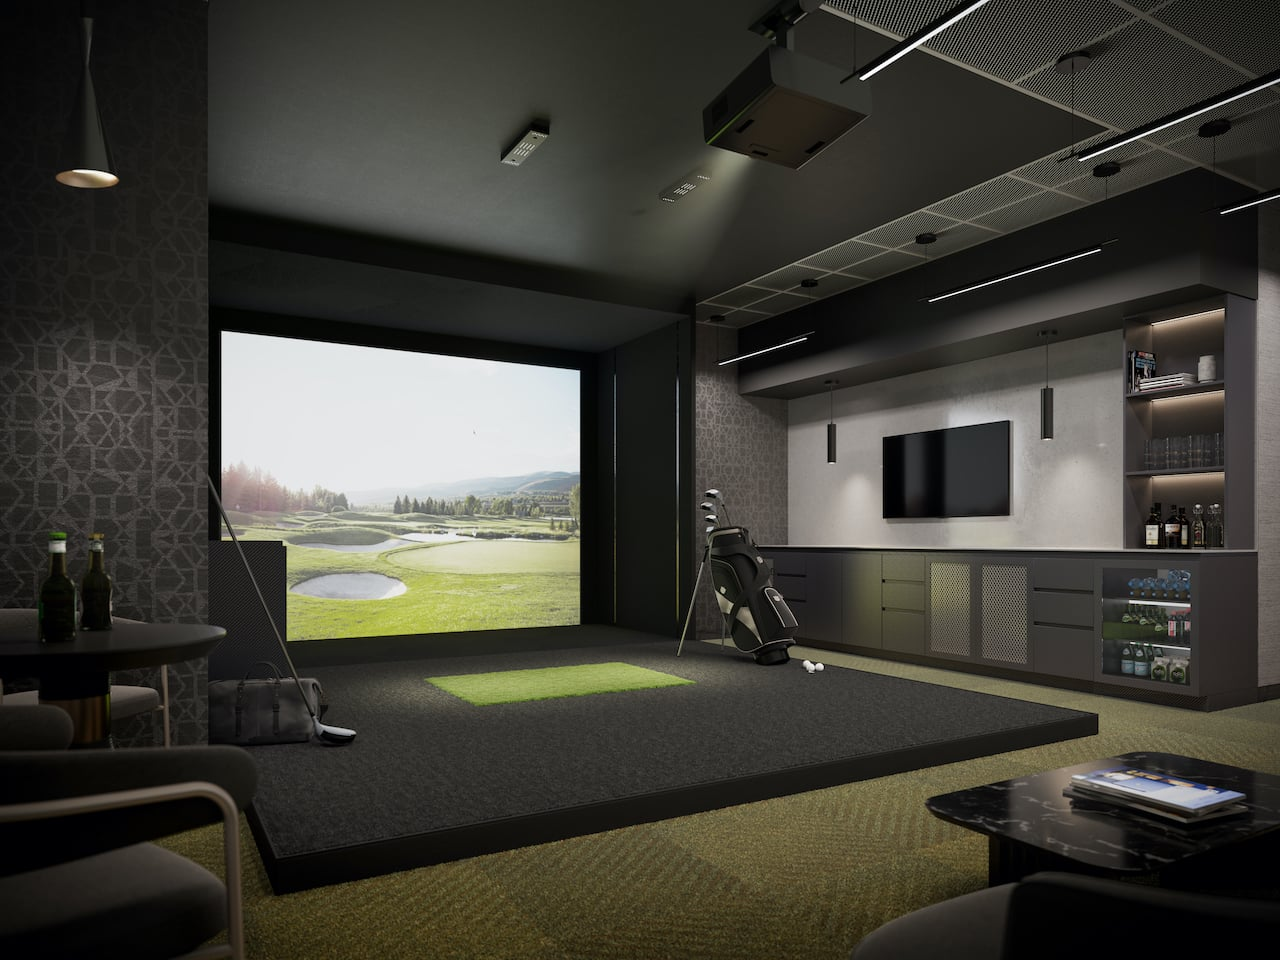 Rendering of Verge 2 Condos golf simulator